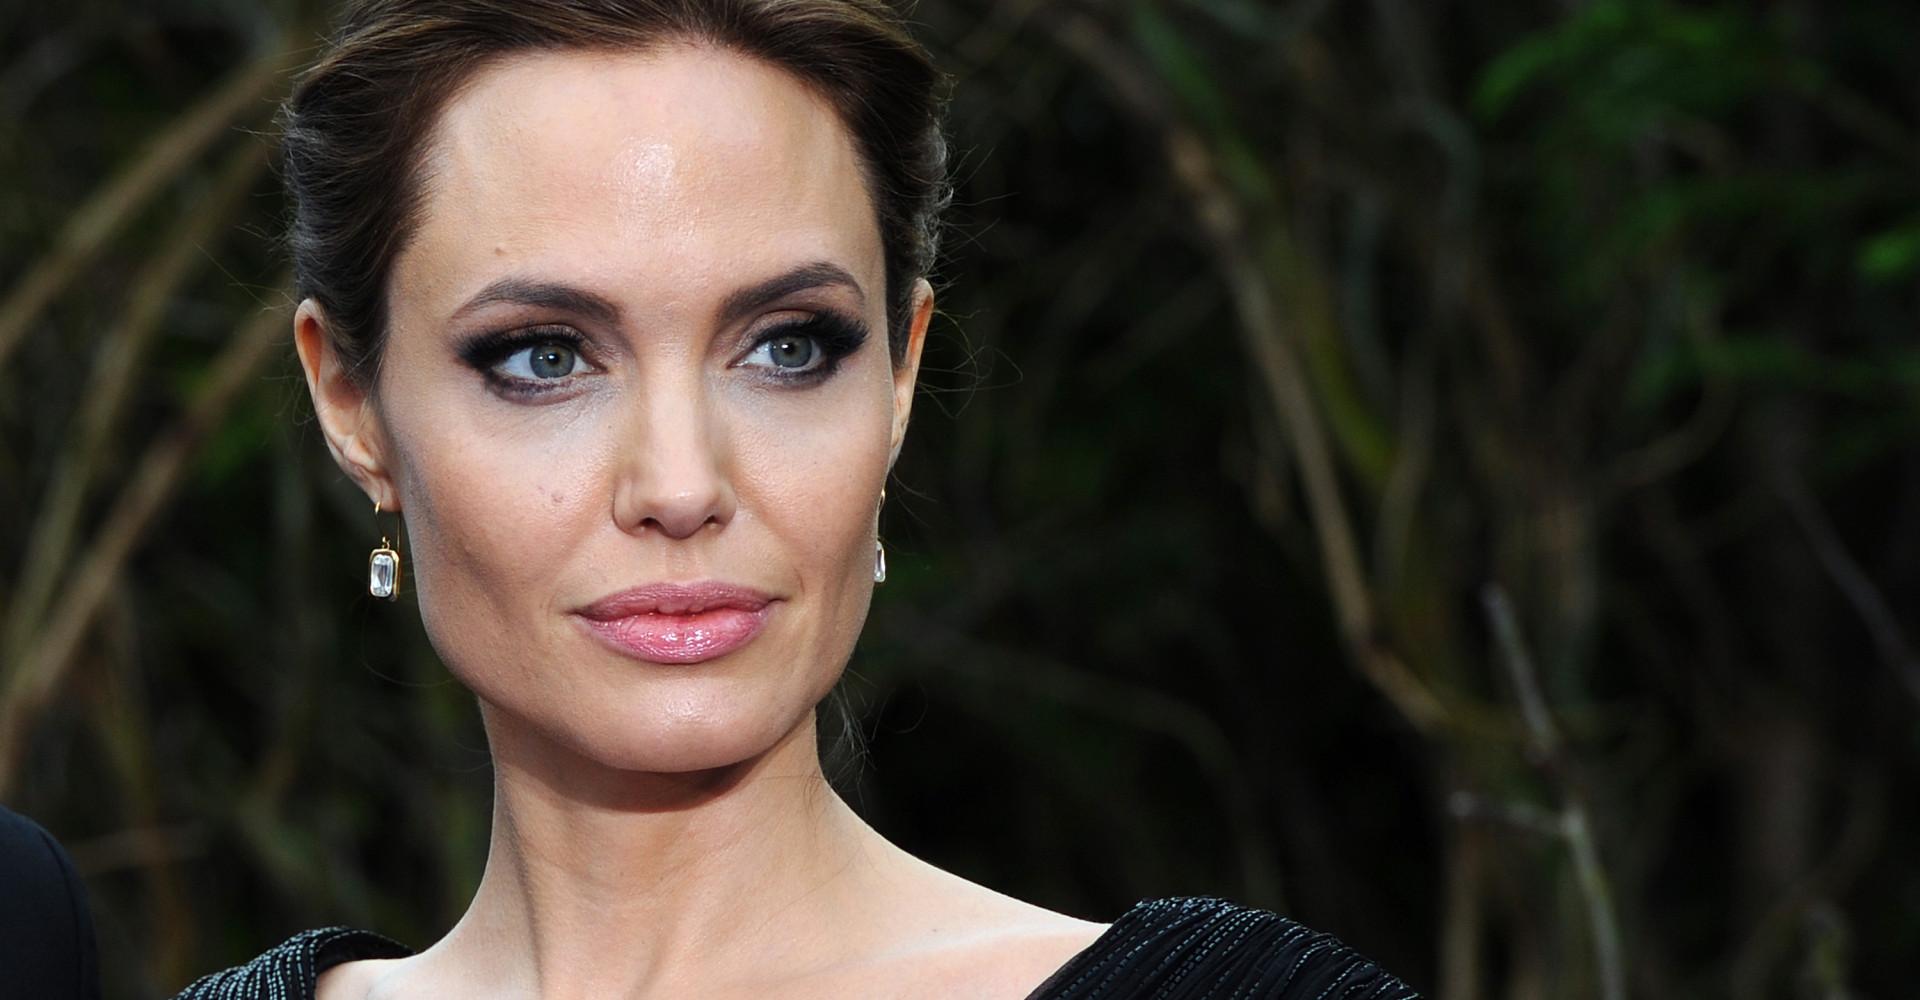 Why did Angelina Jolie fire her lawyer mid-custody battle?